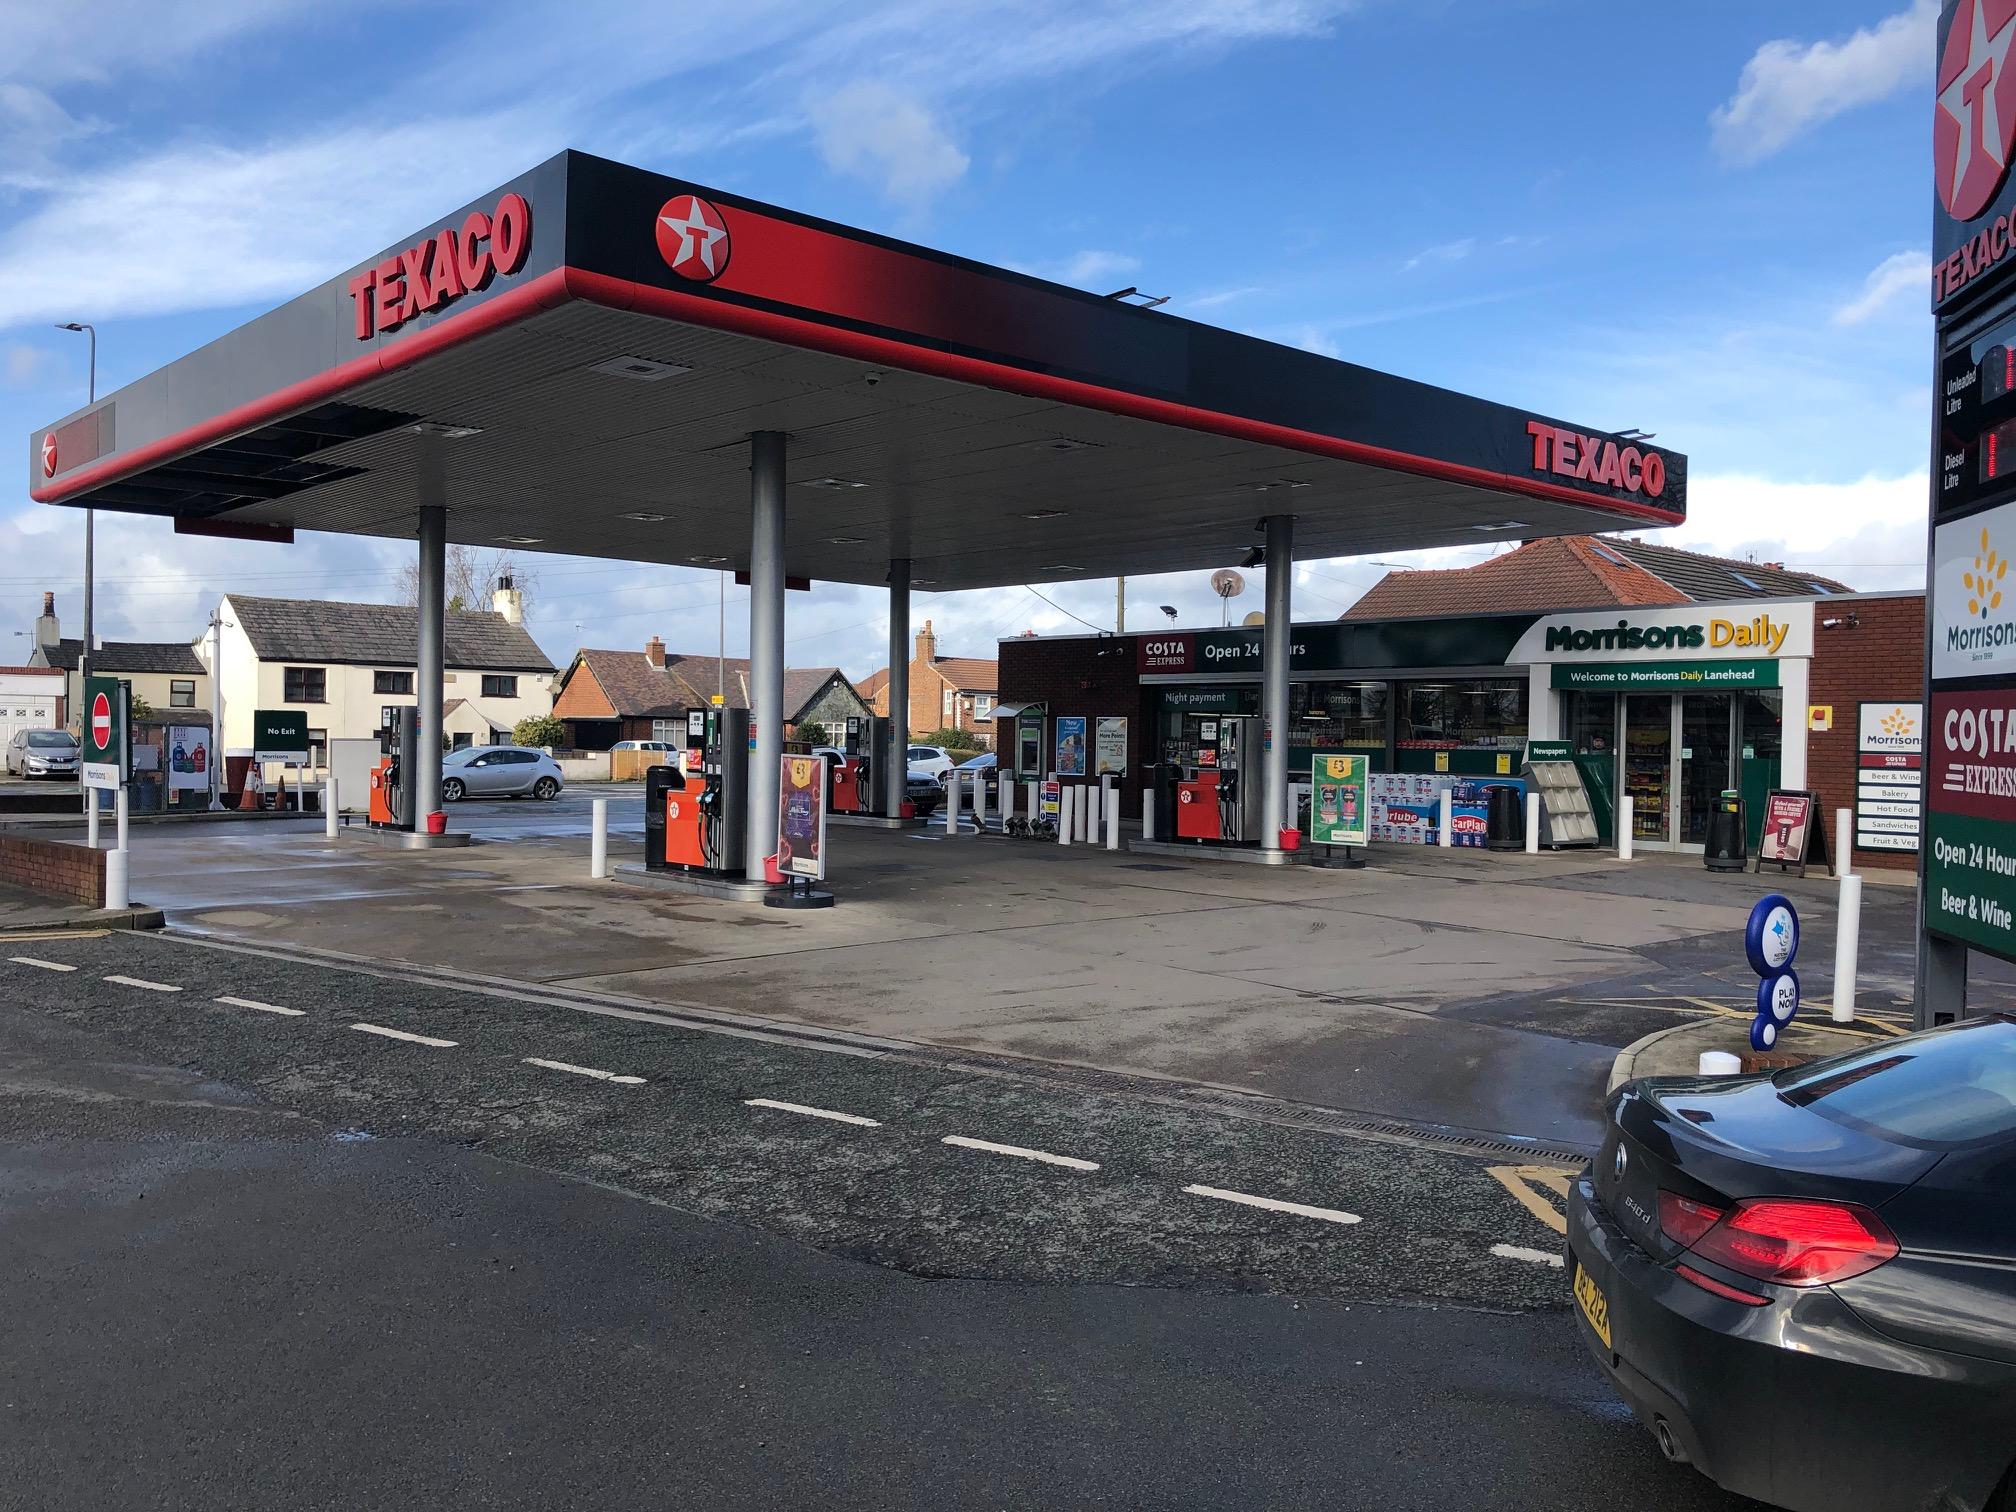 Warrington – Star Lane Head, East Lancs Road – WA3 2BD